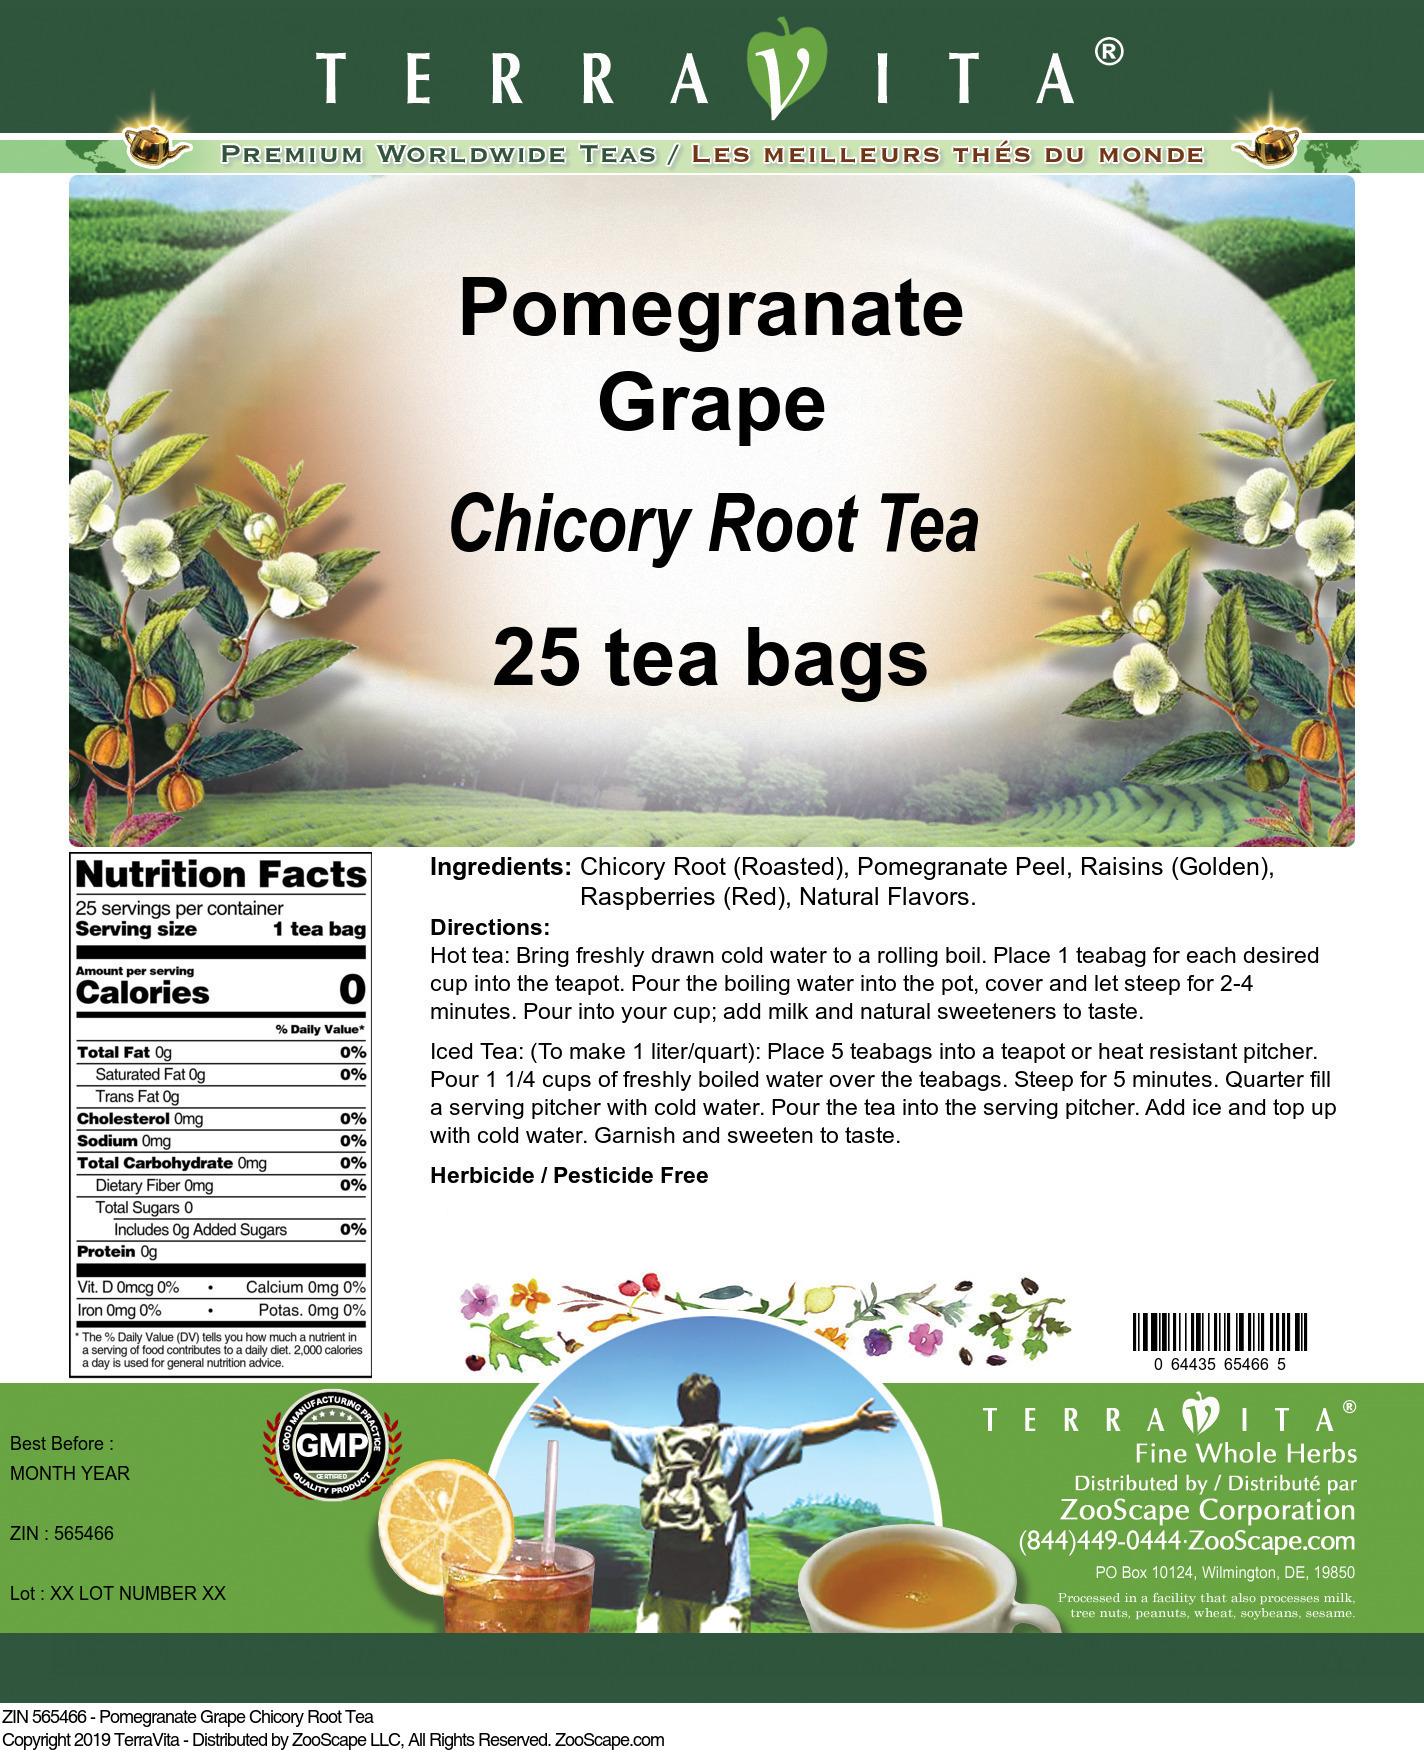 Pomegranate Grape Chicory Root Tea